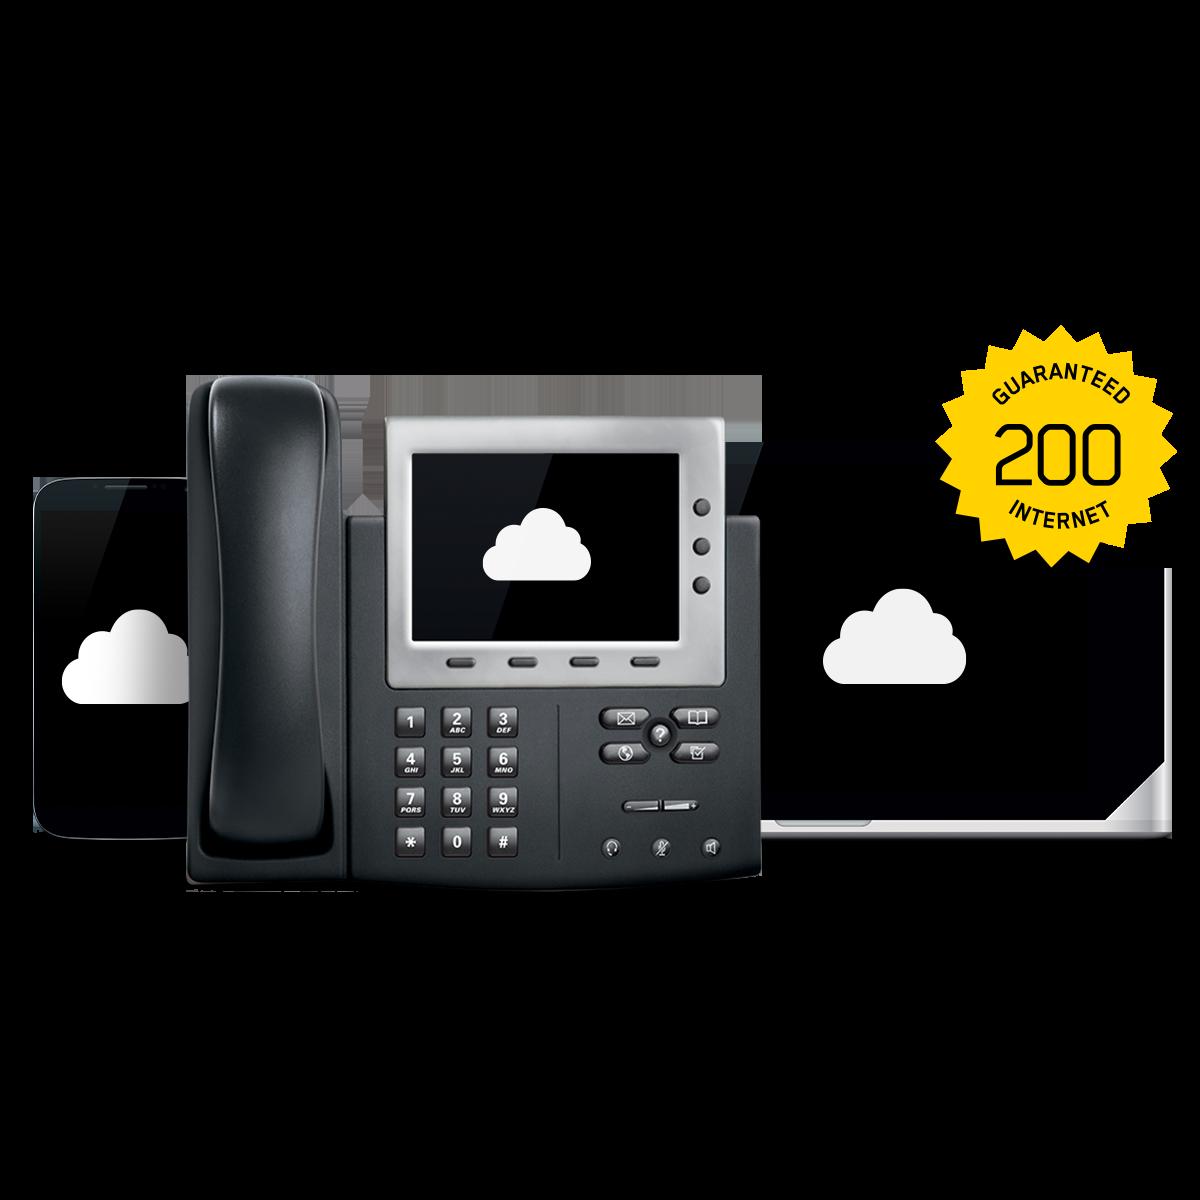 GUARANTEED 200 INTERNET + CLOUD COMMUNICATIONS